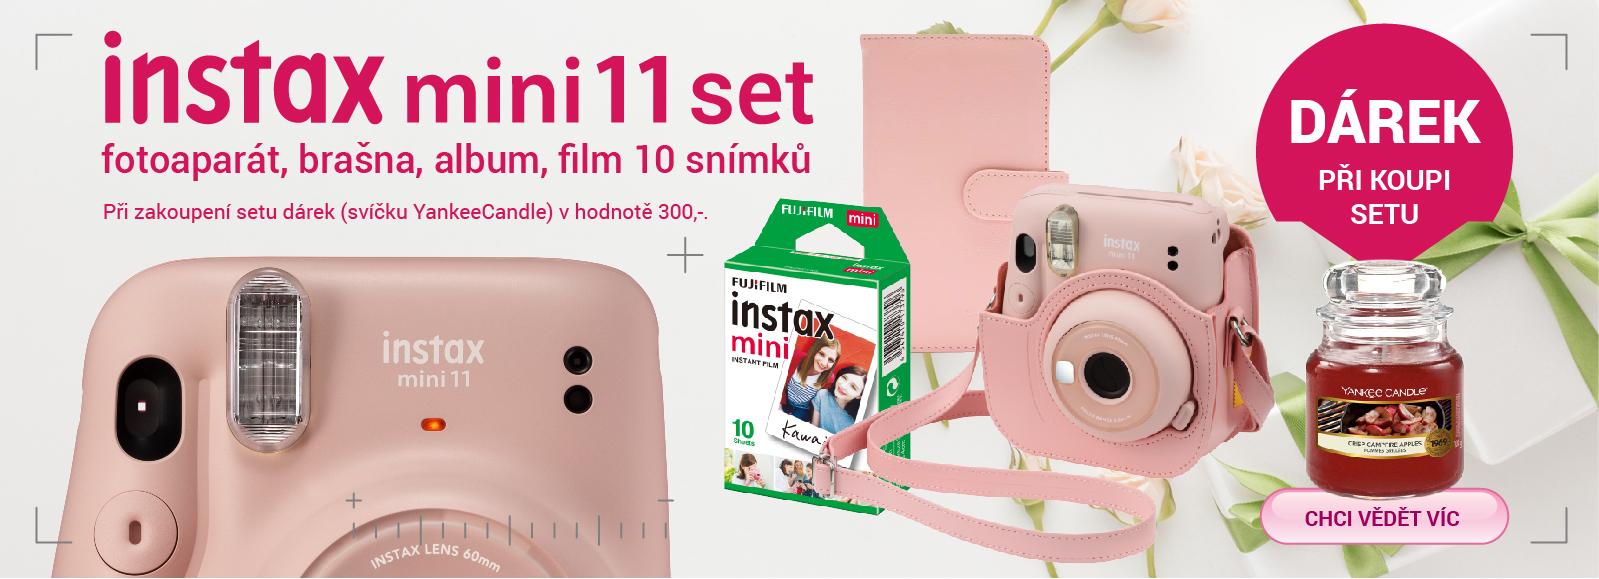 Fujifilm Instax Mini 11 Bundle Set + dárek svíčka YankeeCandle